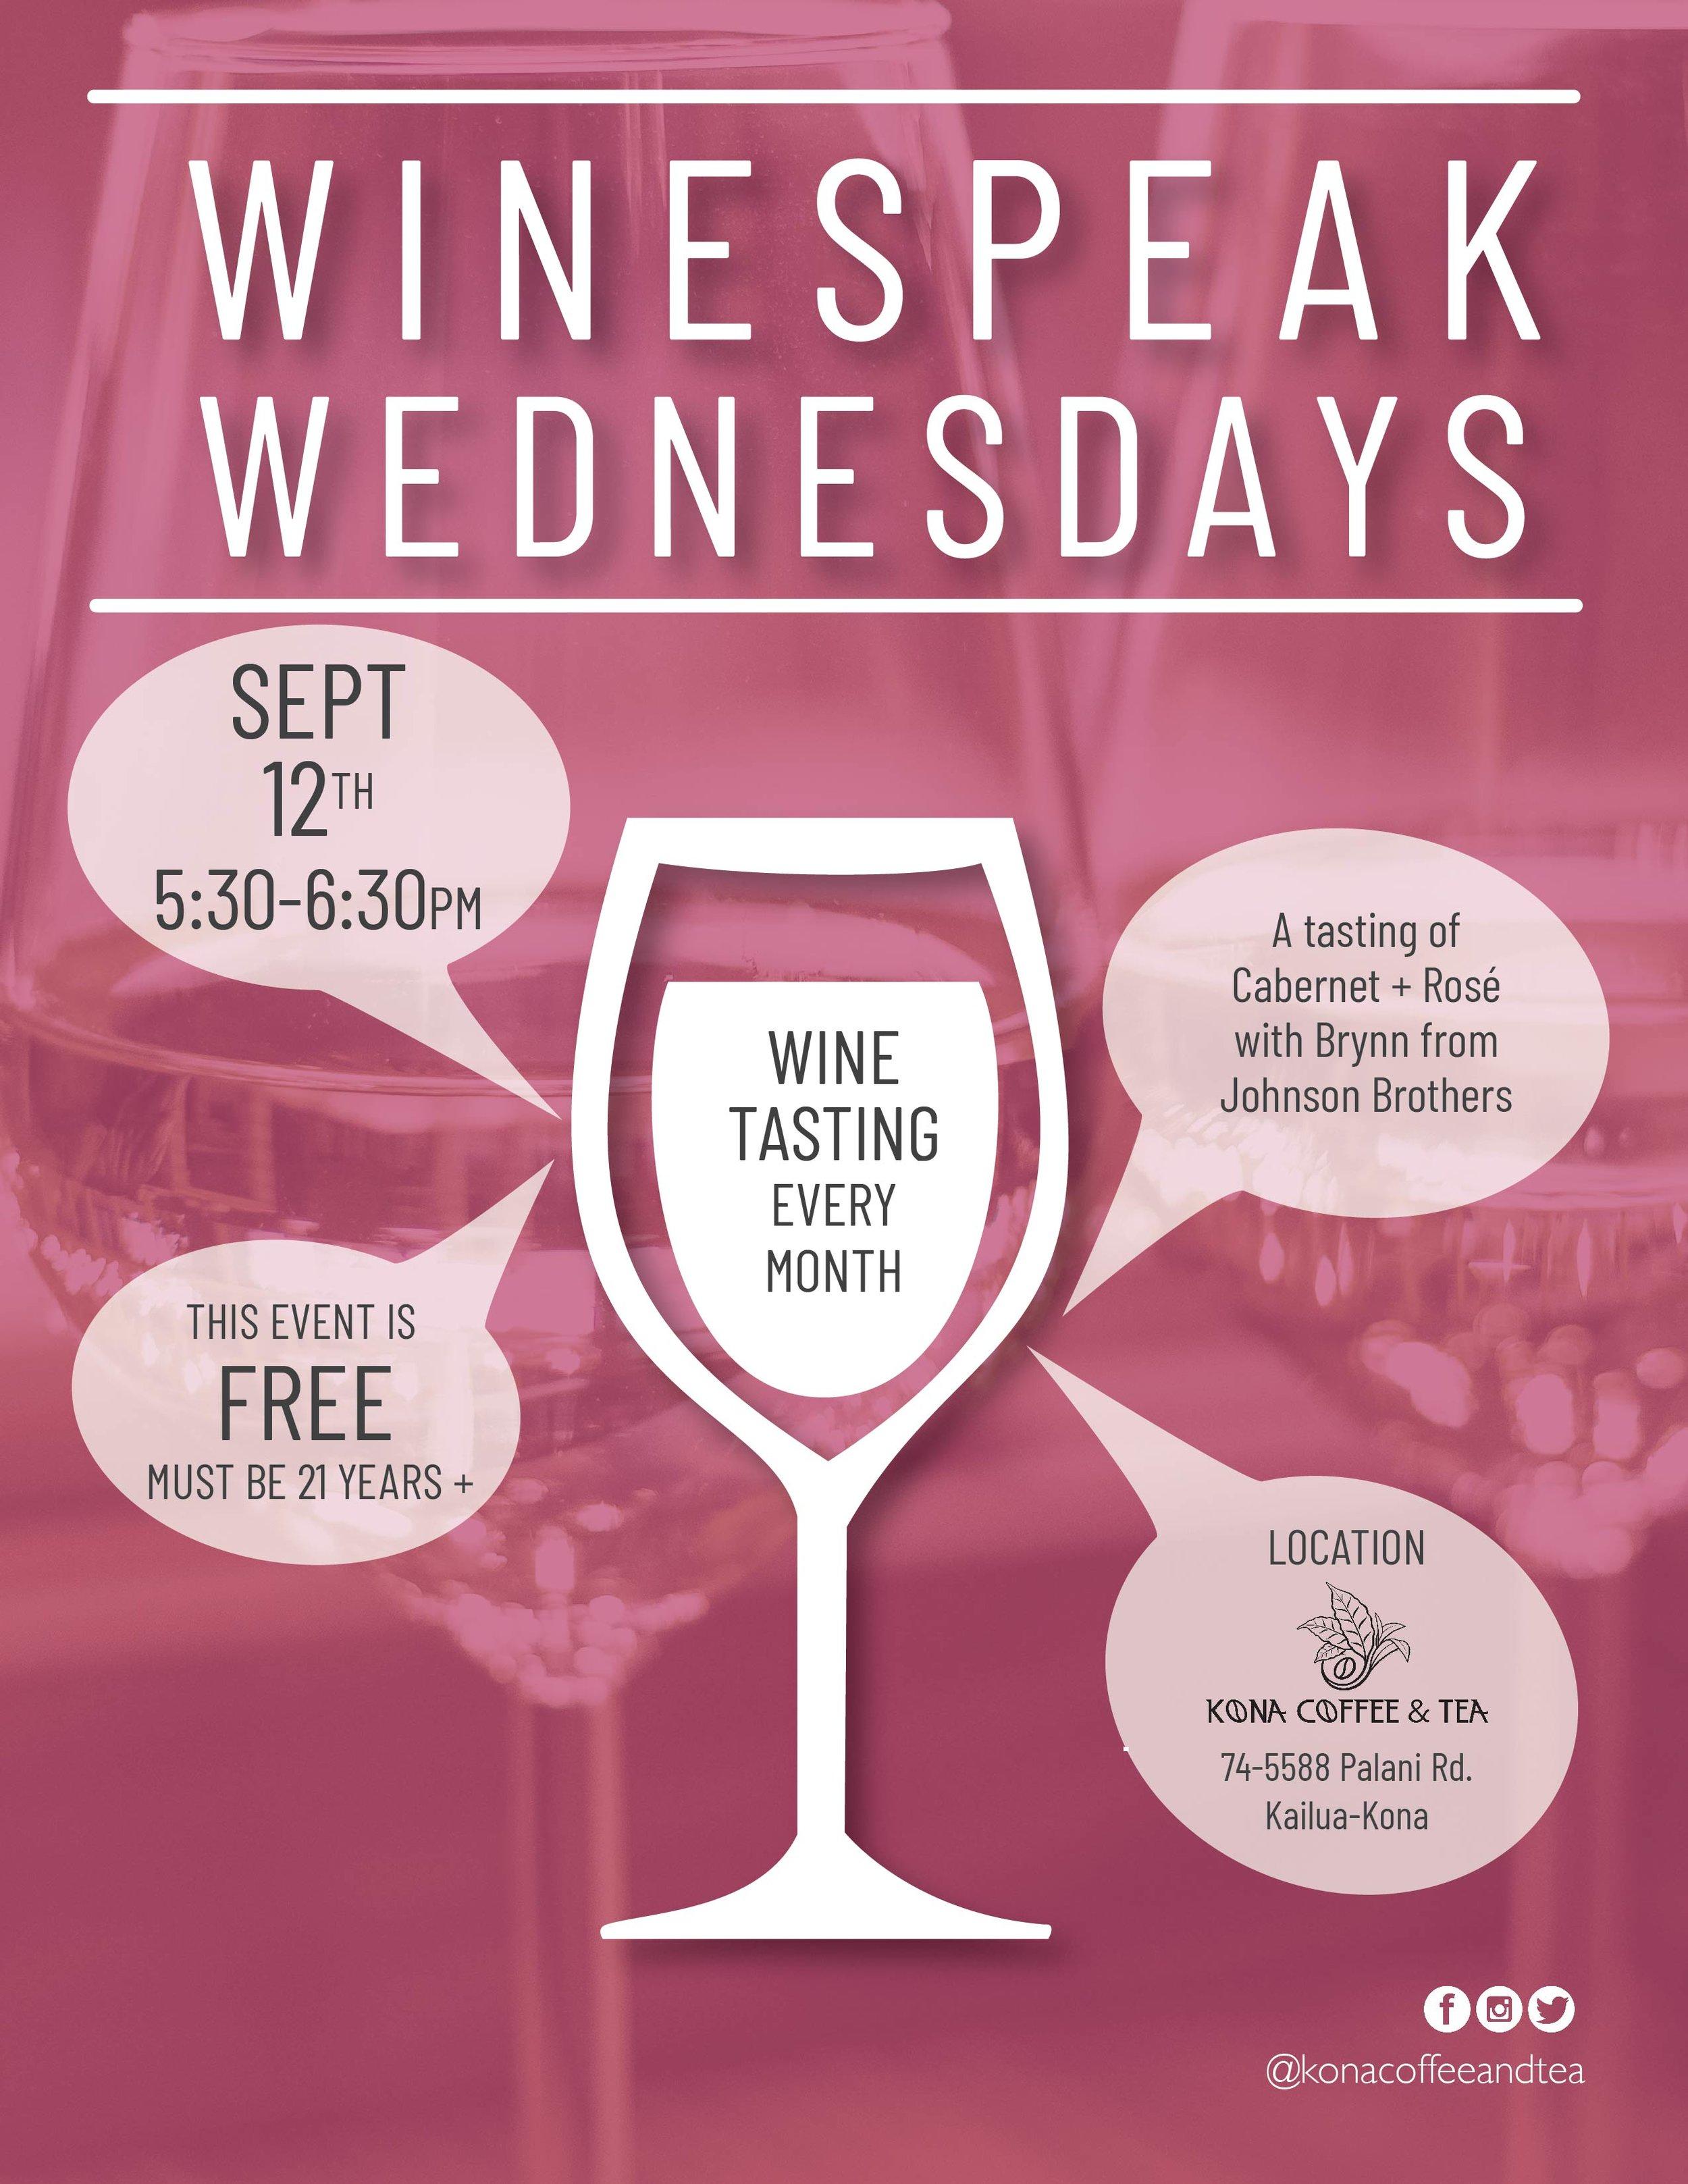 WineSpeak Wednesdays_9.12.18_KCTC 11x17 poster-01.jpg